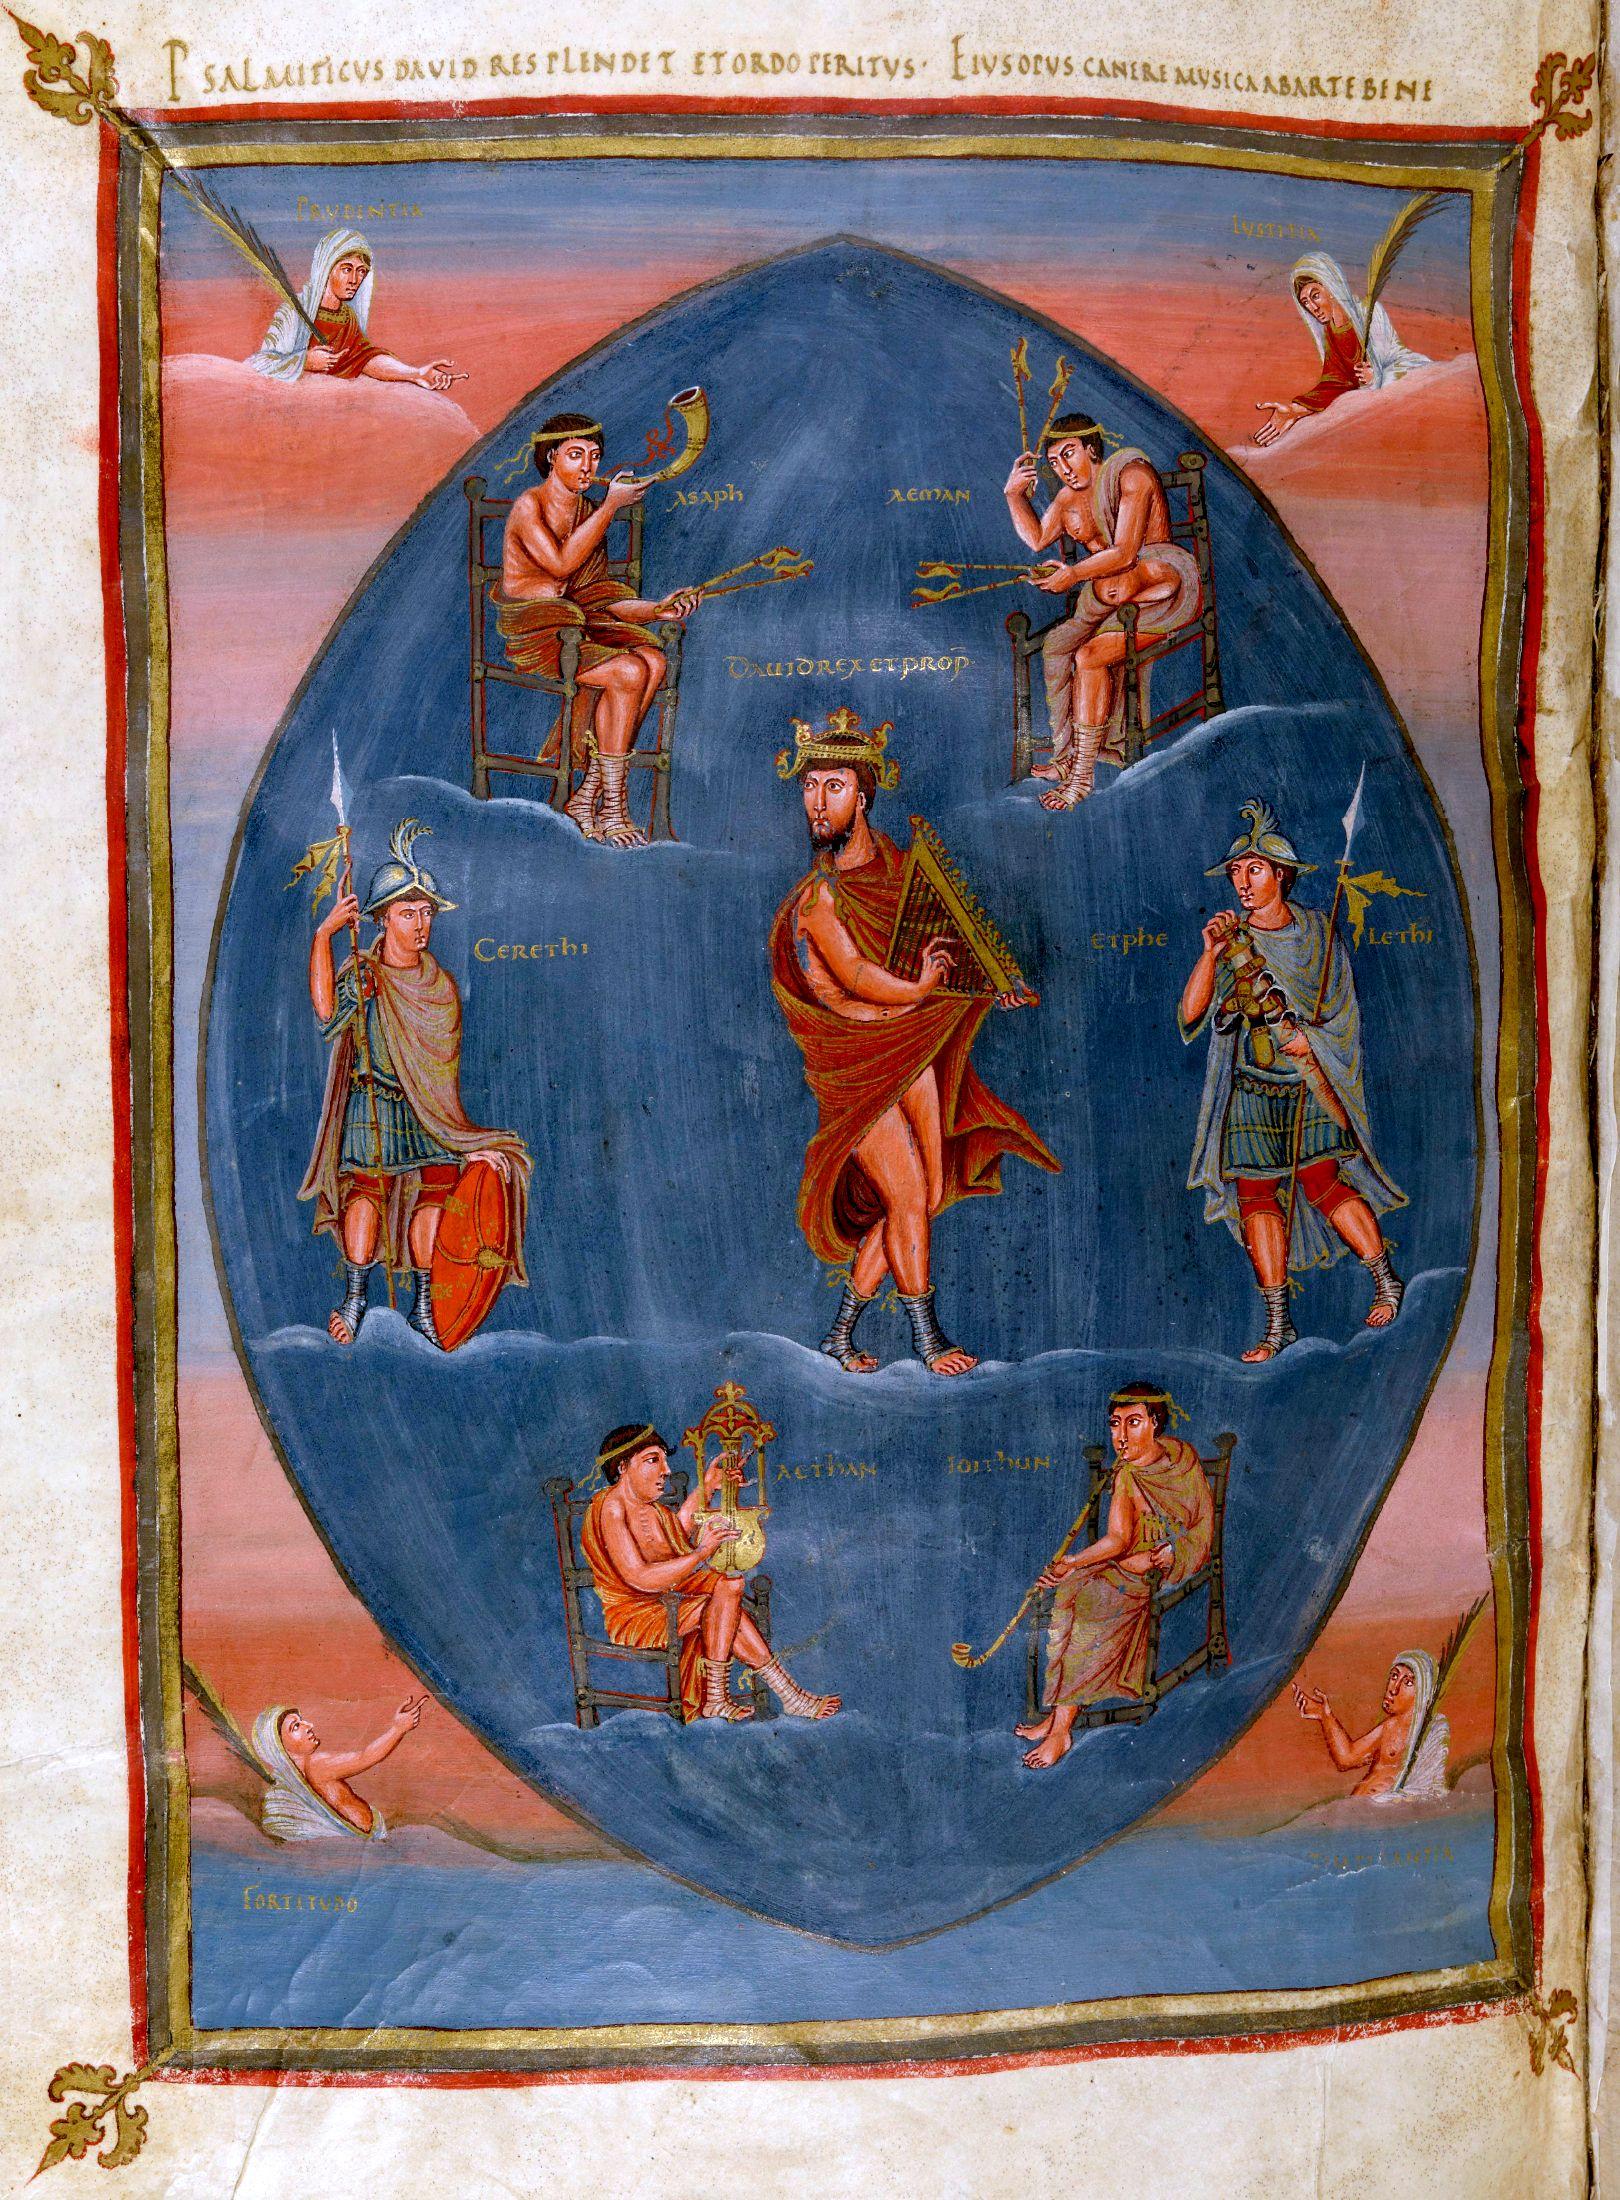 Charles The Bald Bible C 845 A D Bnf Manuscrits Latin 1 Fol 215v Http Gallica Bnf Fr Ark 12148 Btv1b8455903b F438 Art Historique Art Medieval Bnf